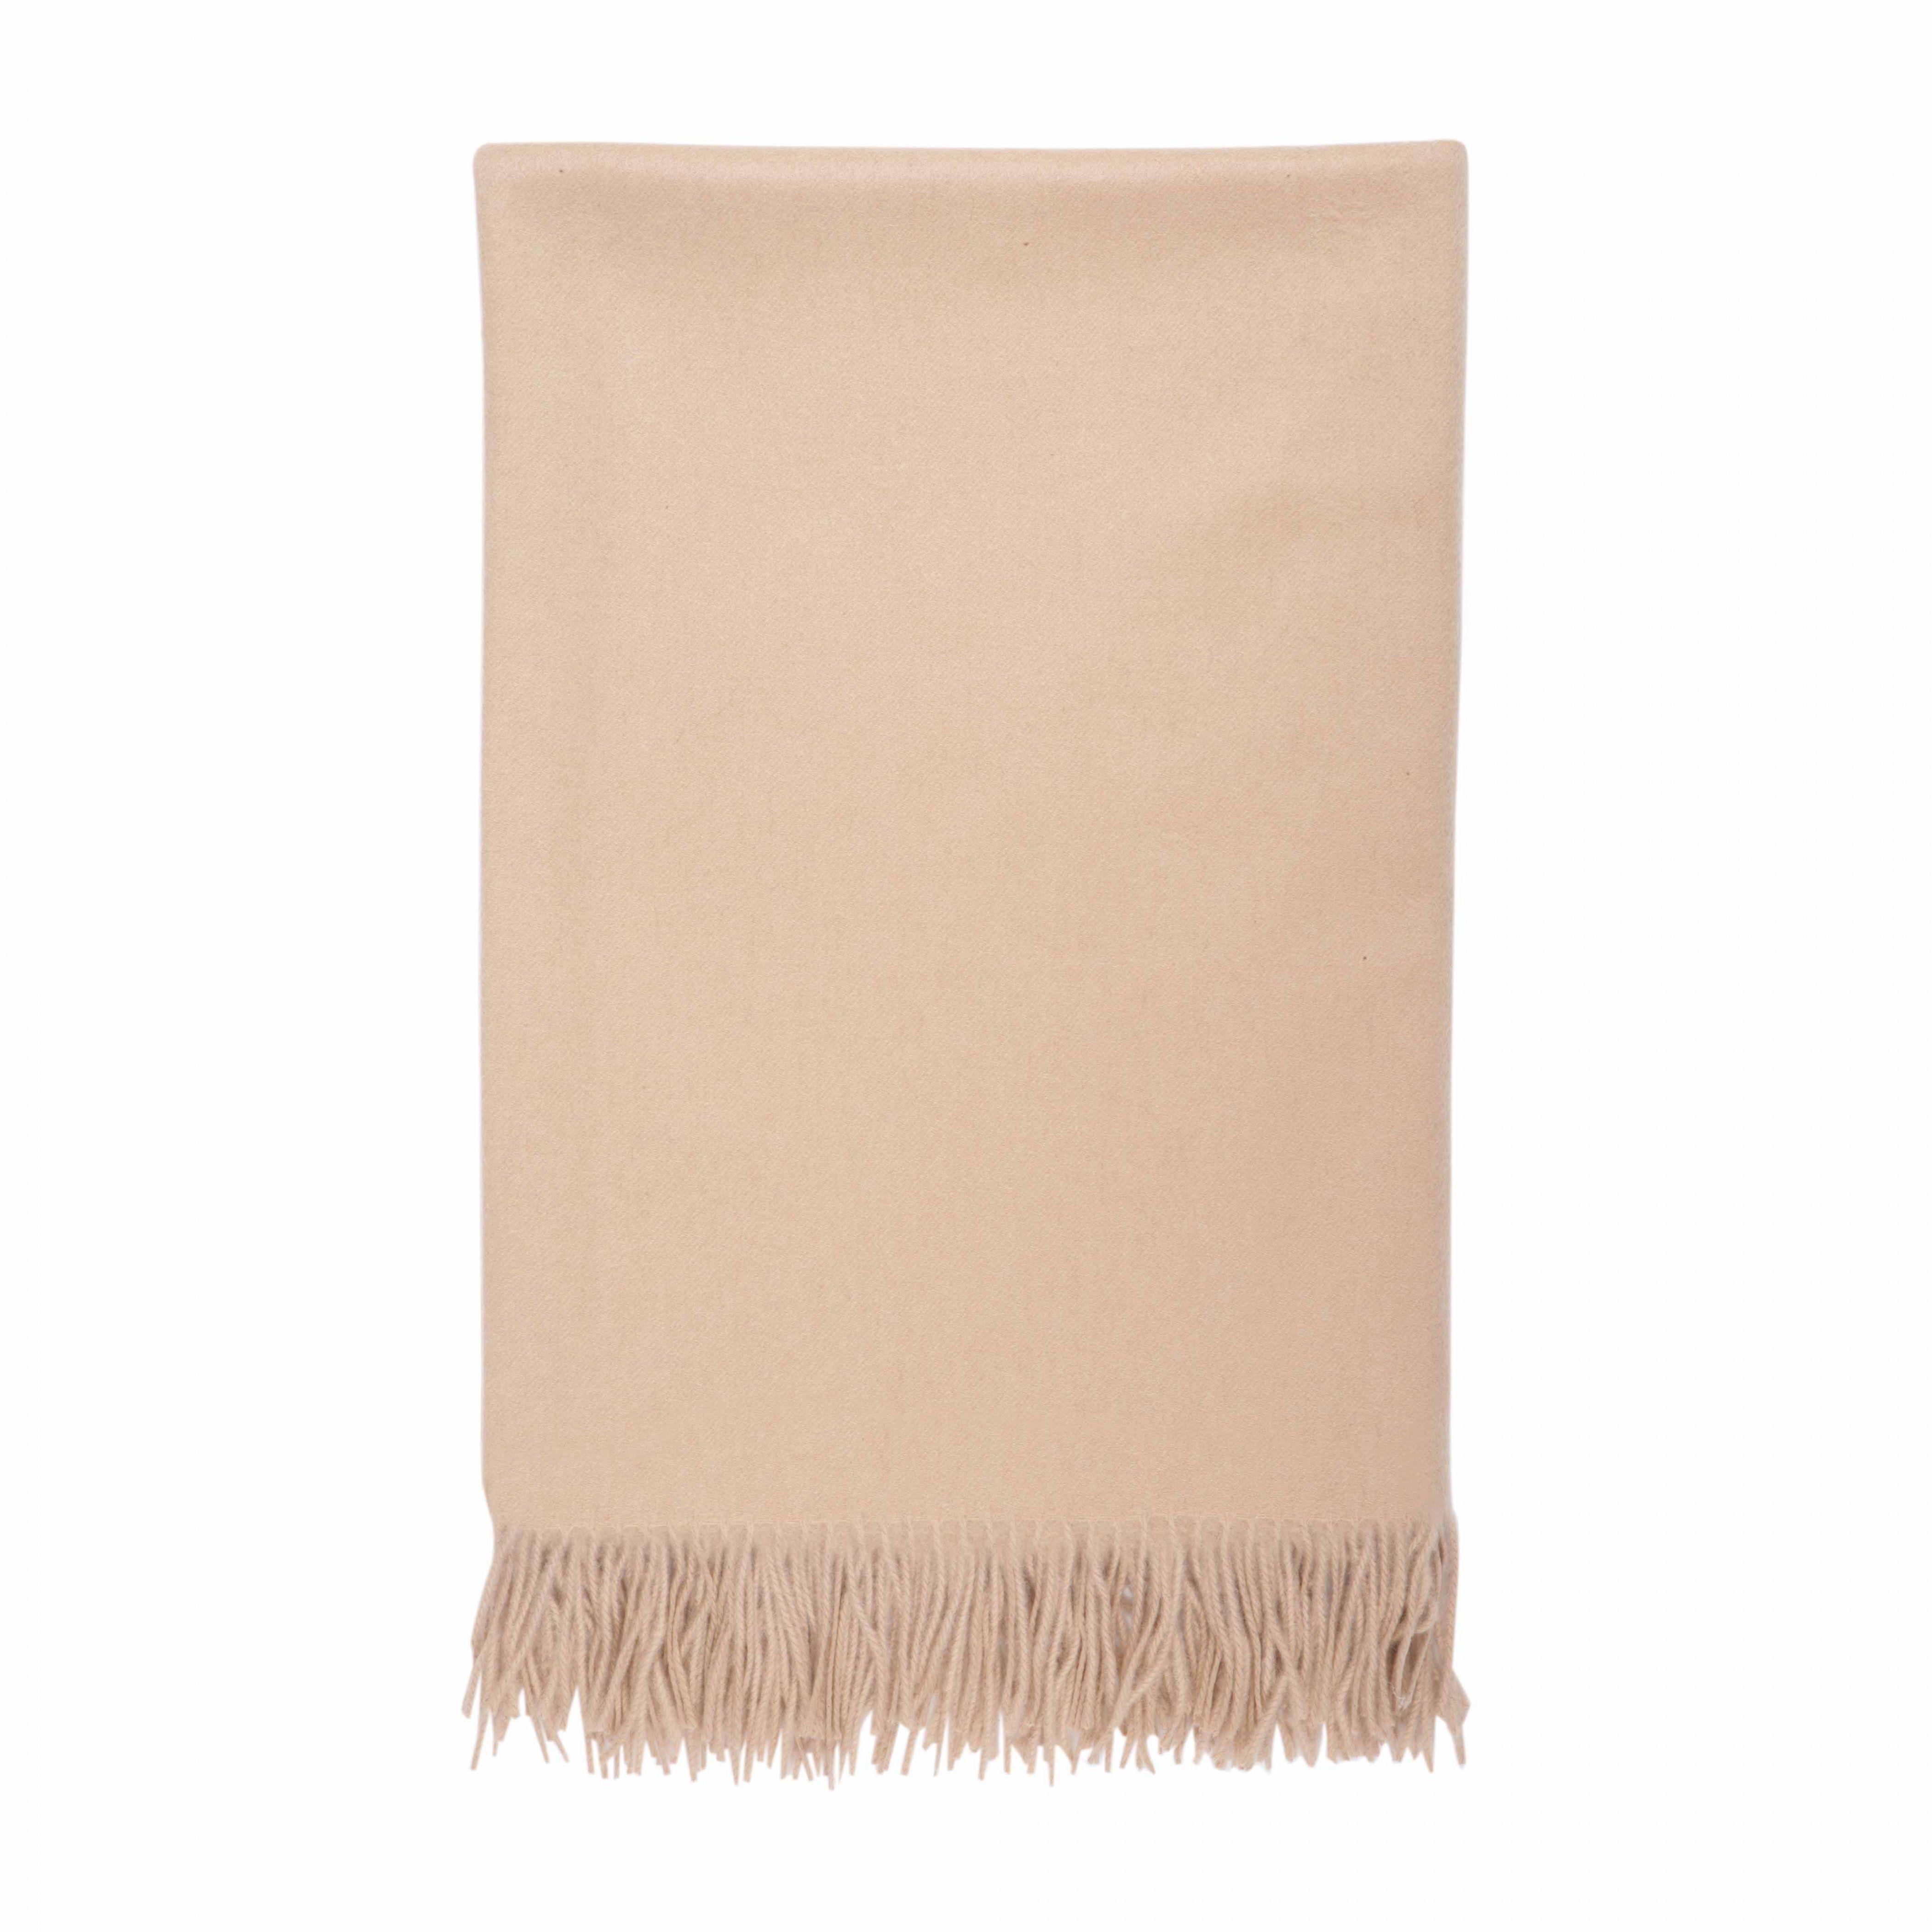 Cashmere Oatmeal Plain Throw